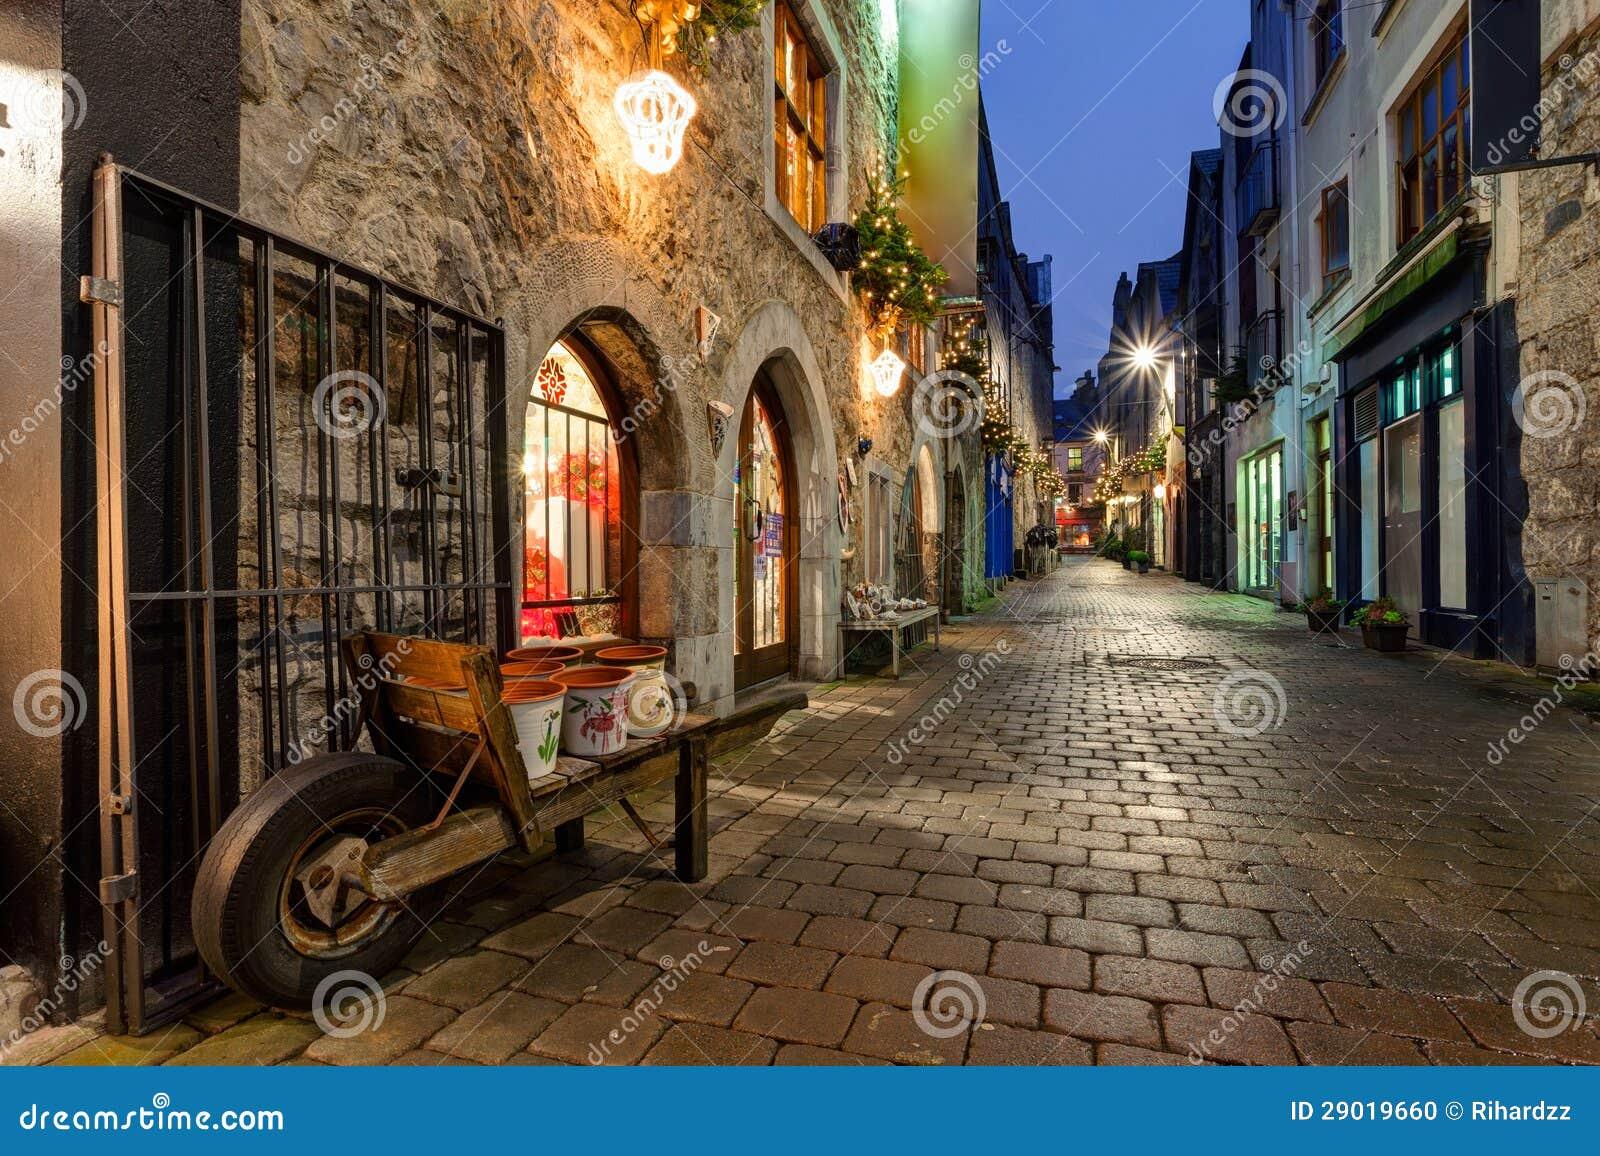 Galway kerwan s lane decorated with christmas lights night scene